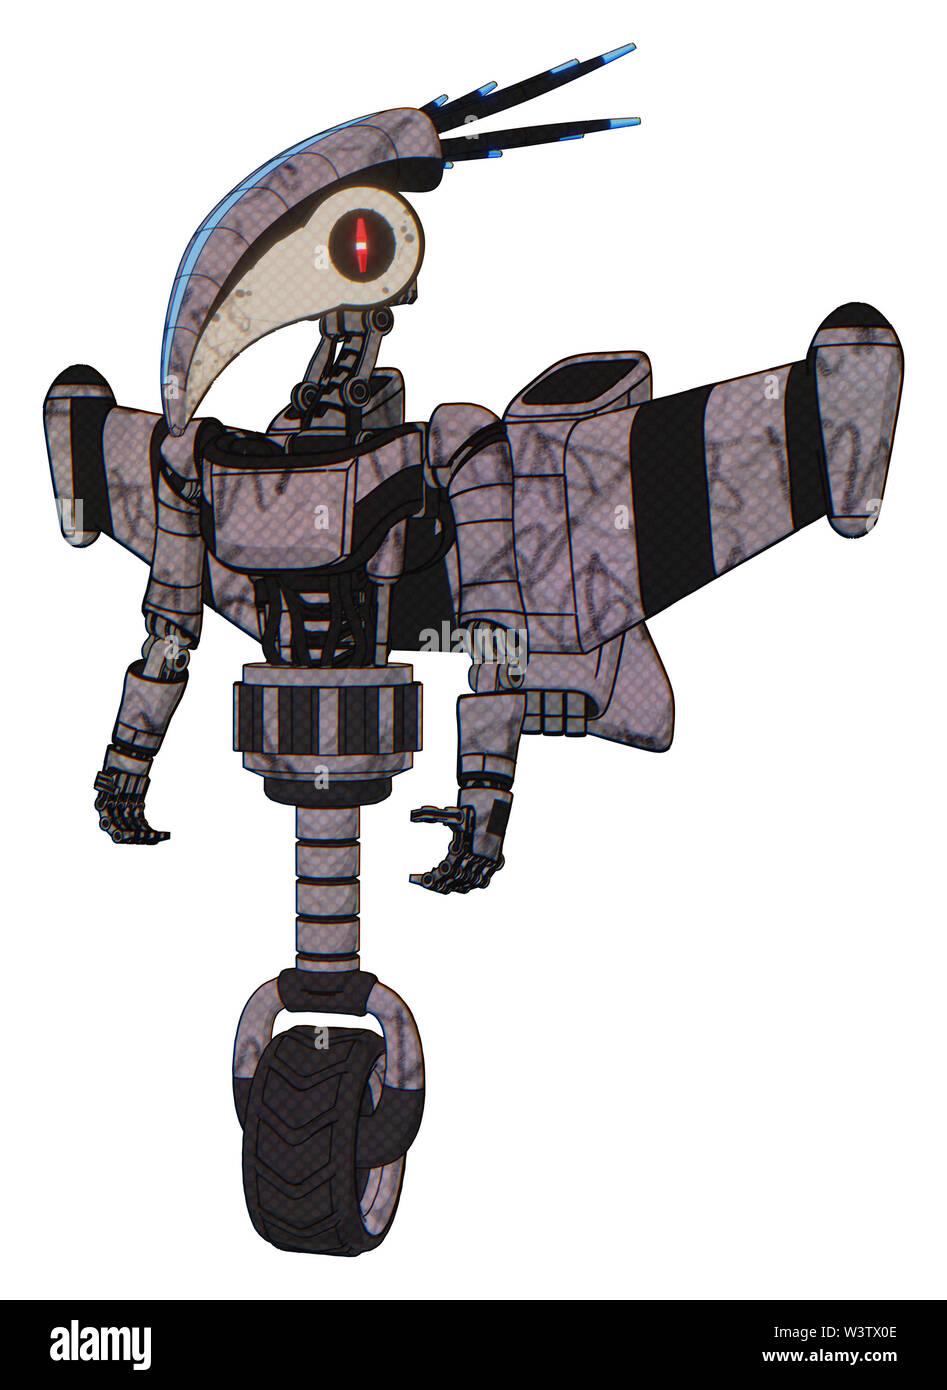 Cyborg containing elements: bird skull head, red line eyes, head shield design, light chest exoshielding, ultralight chest exosuit, stellar jet wing r - Stock Image